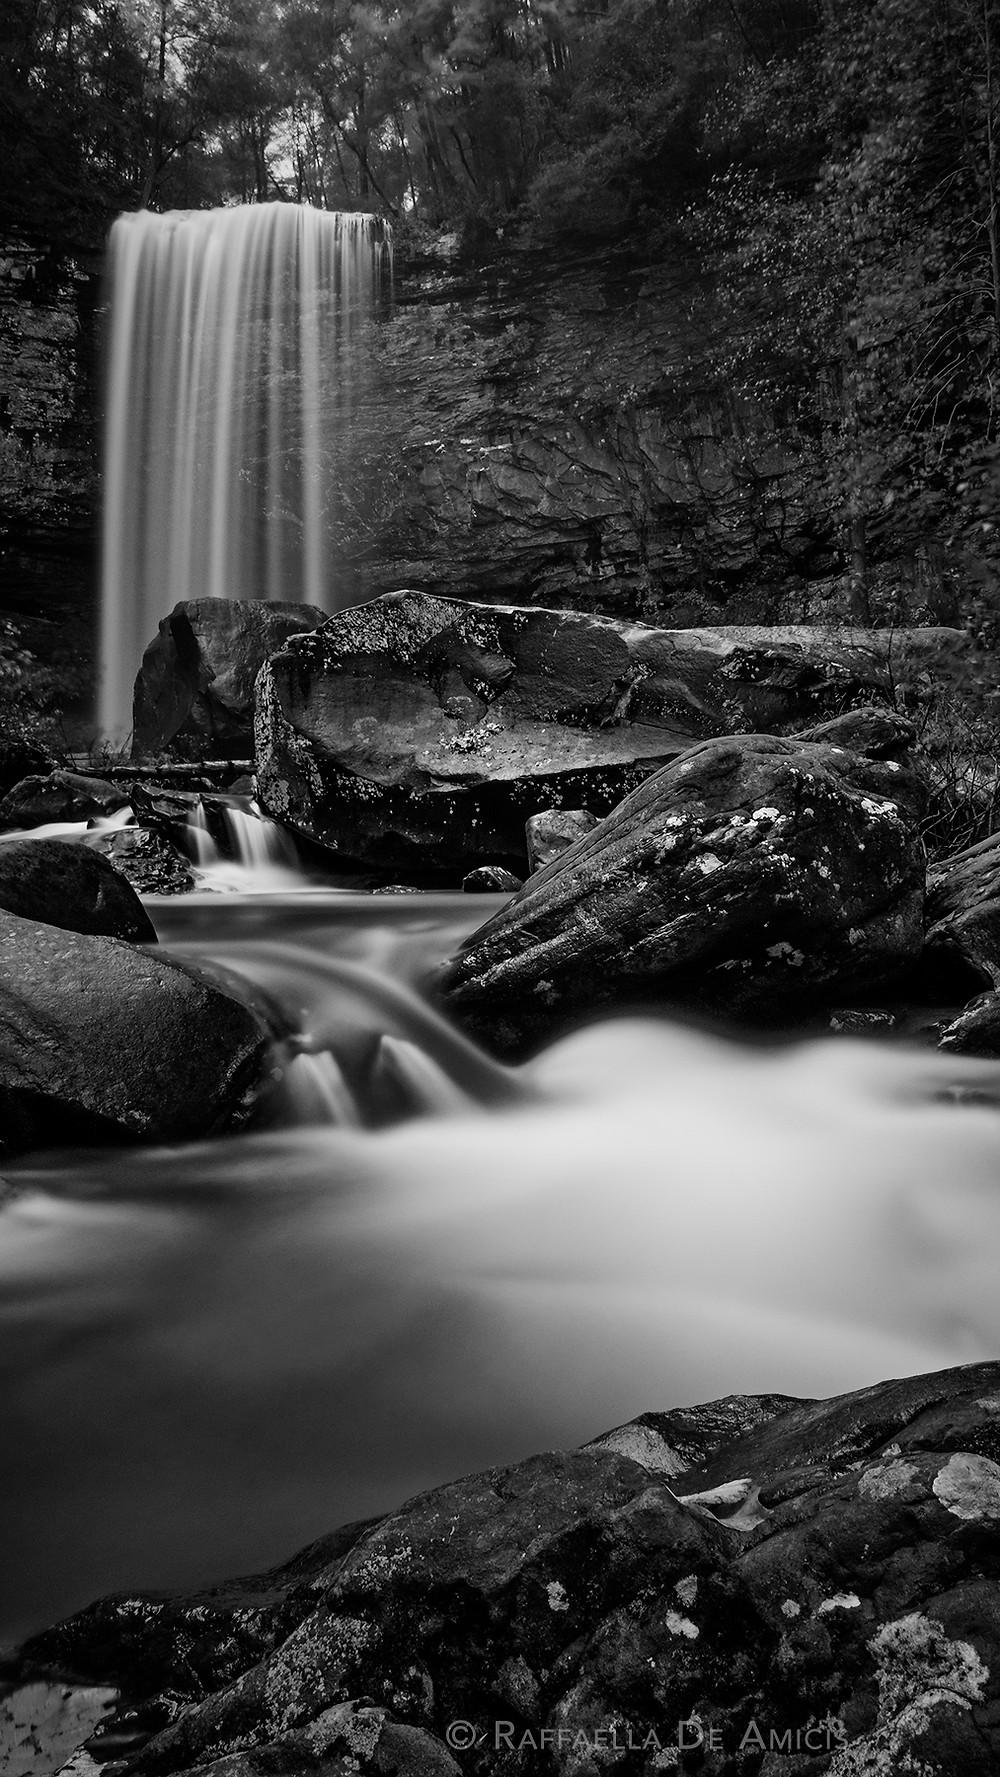 waterfall at cloudland canyon long exposure black and white